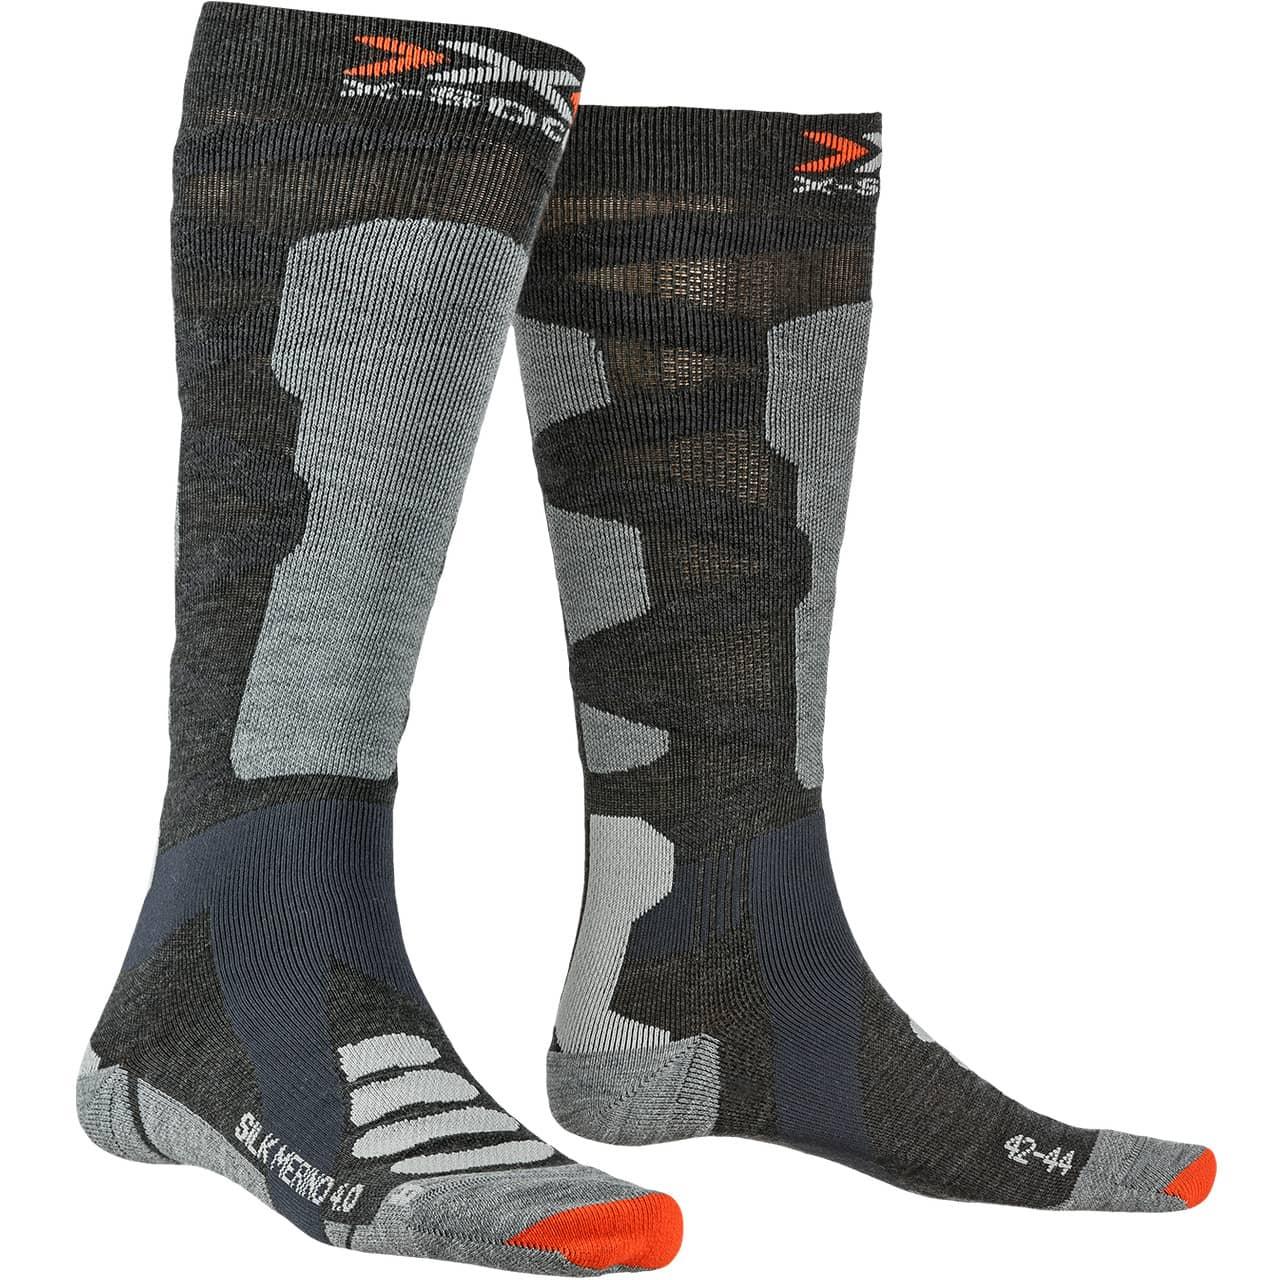 Calze Invernali da Sci Unisex Bambini Anthracite X-Socks Junior 4.0